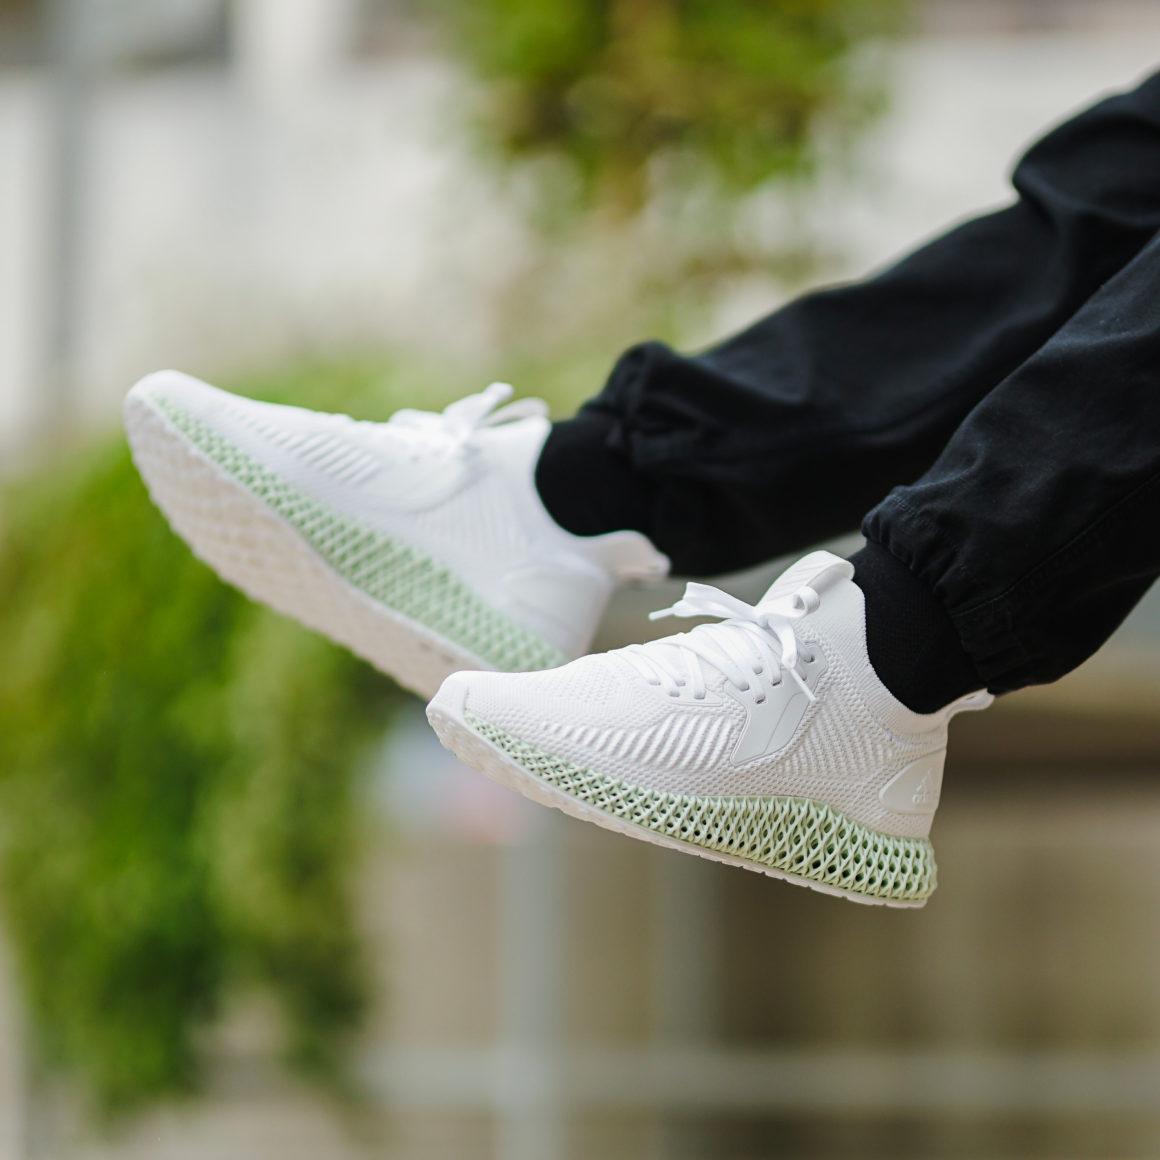 adidas Alphaedge 4D White/Carbon